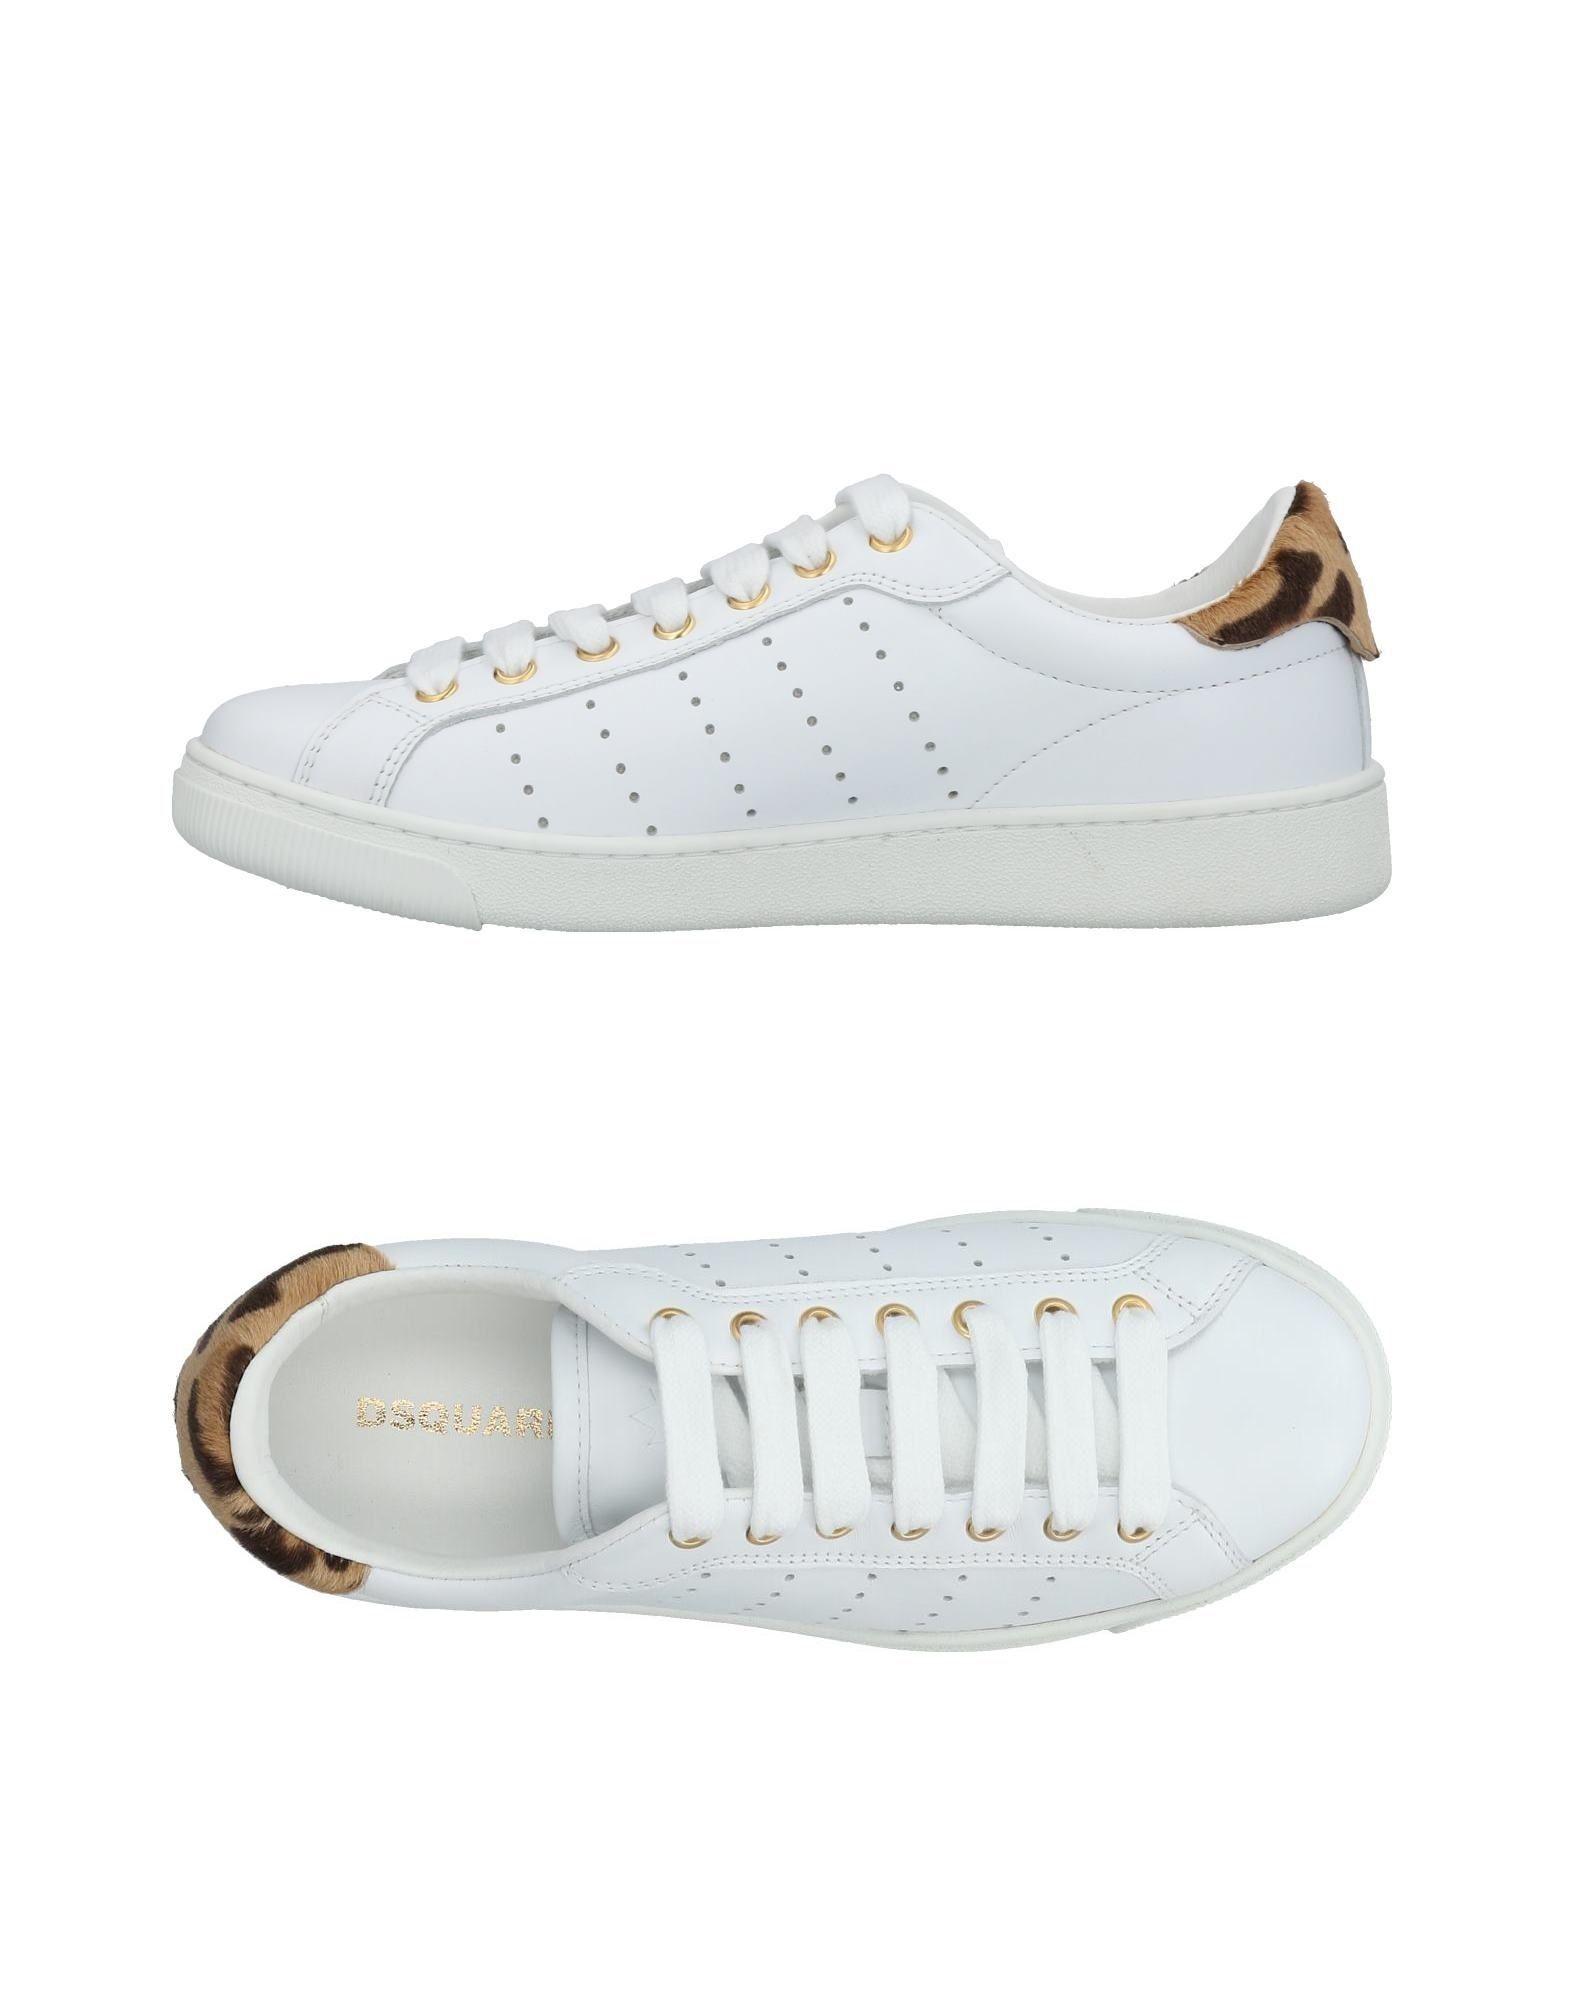 Dsquared2 Sneakers Damen  11459795TSGut aussehende strapazierfähige strapazierfähige strapazierfähige Schuhe d231b8